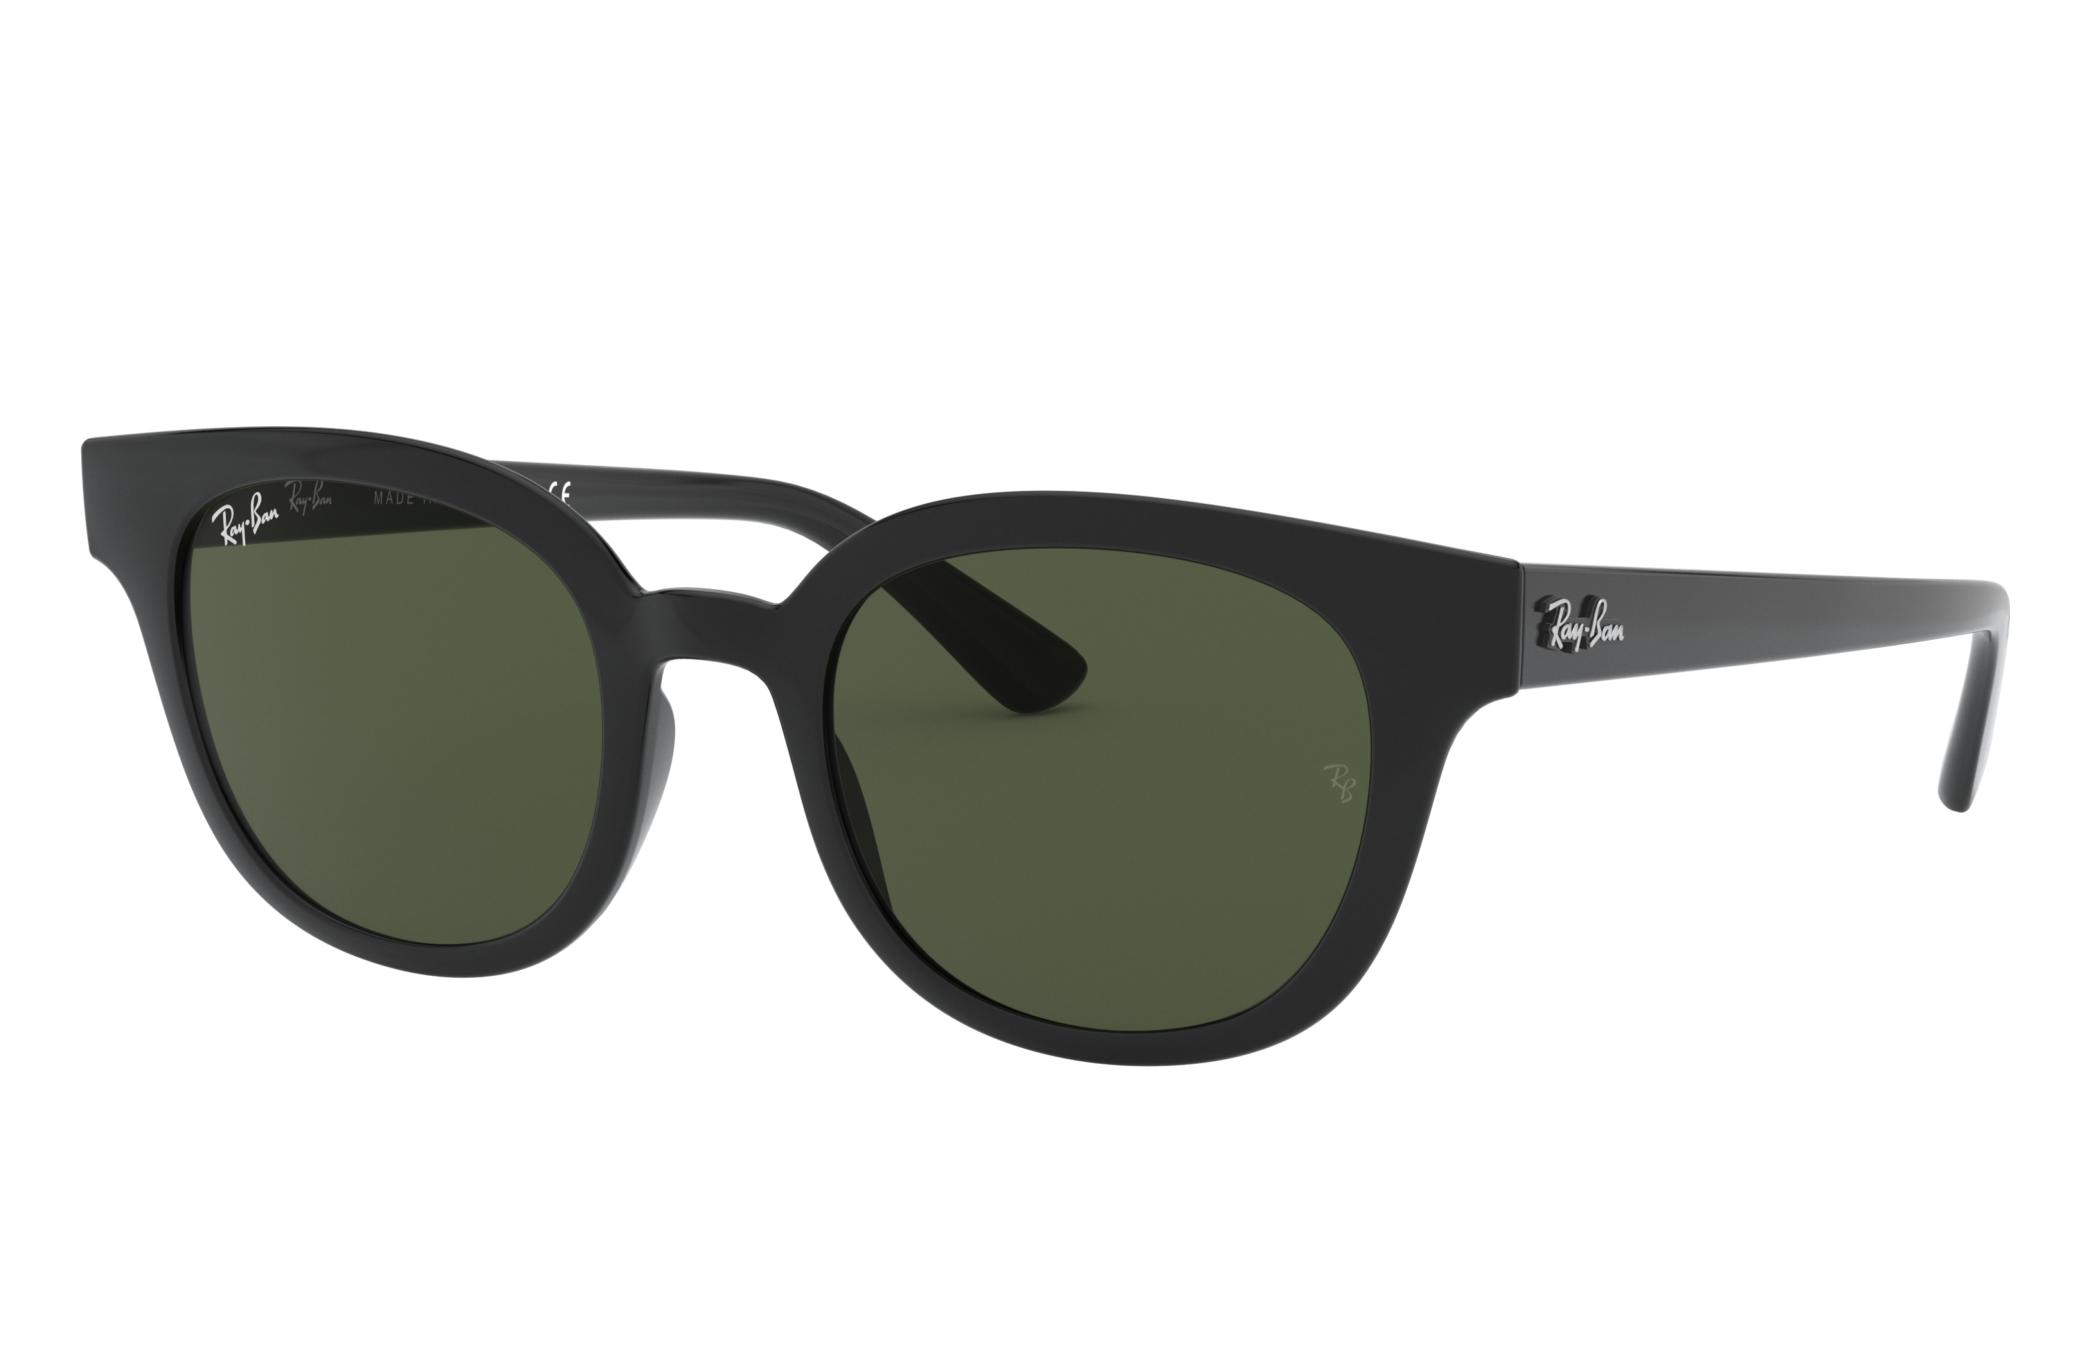 Ray-Ban Rb4324 Low Bridge Fit Black, Green Lenses - RB4324F